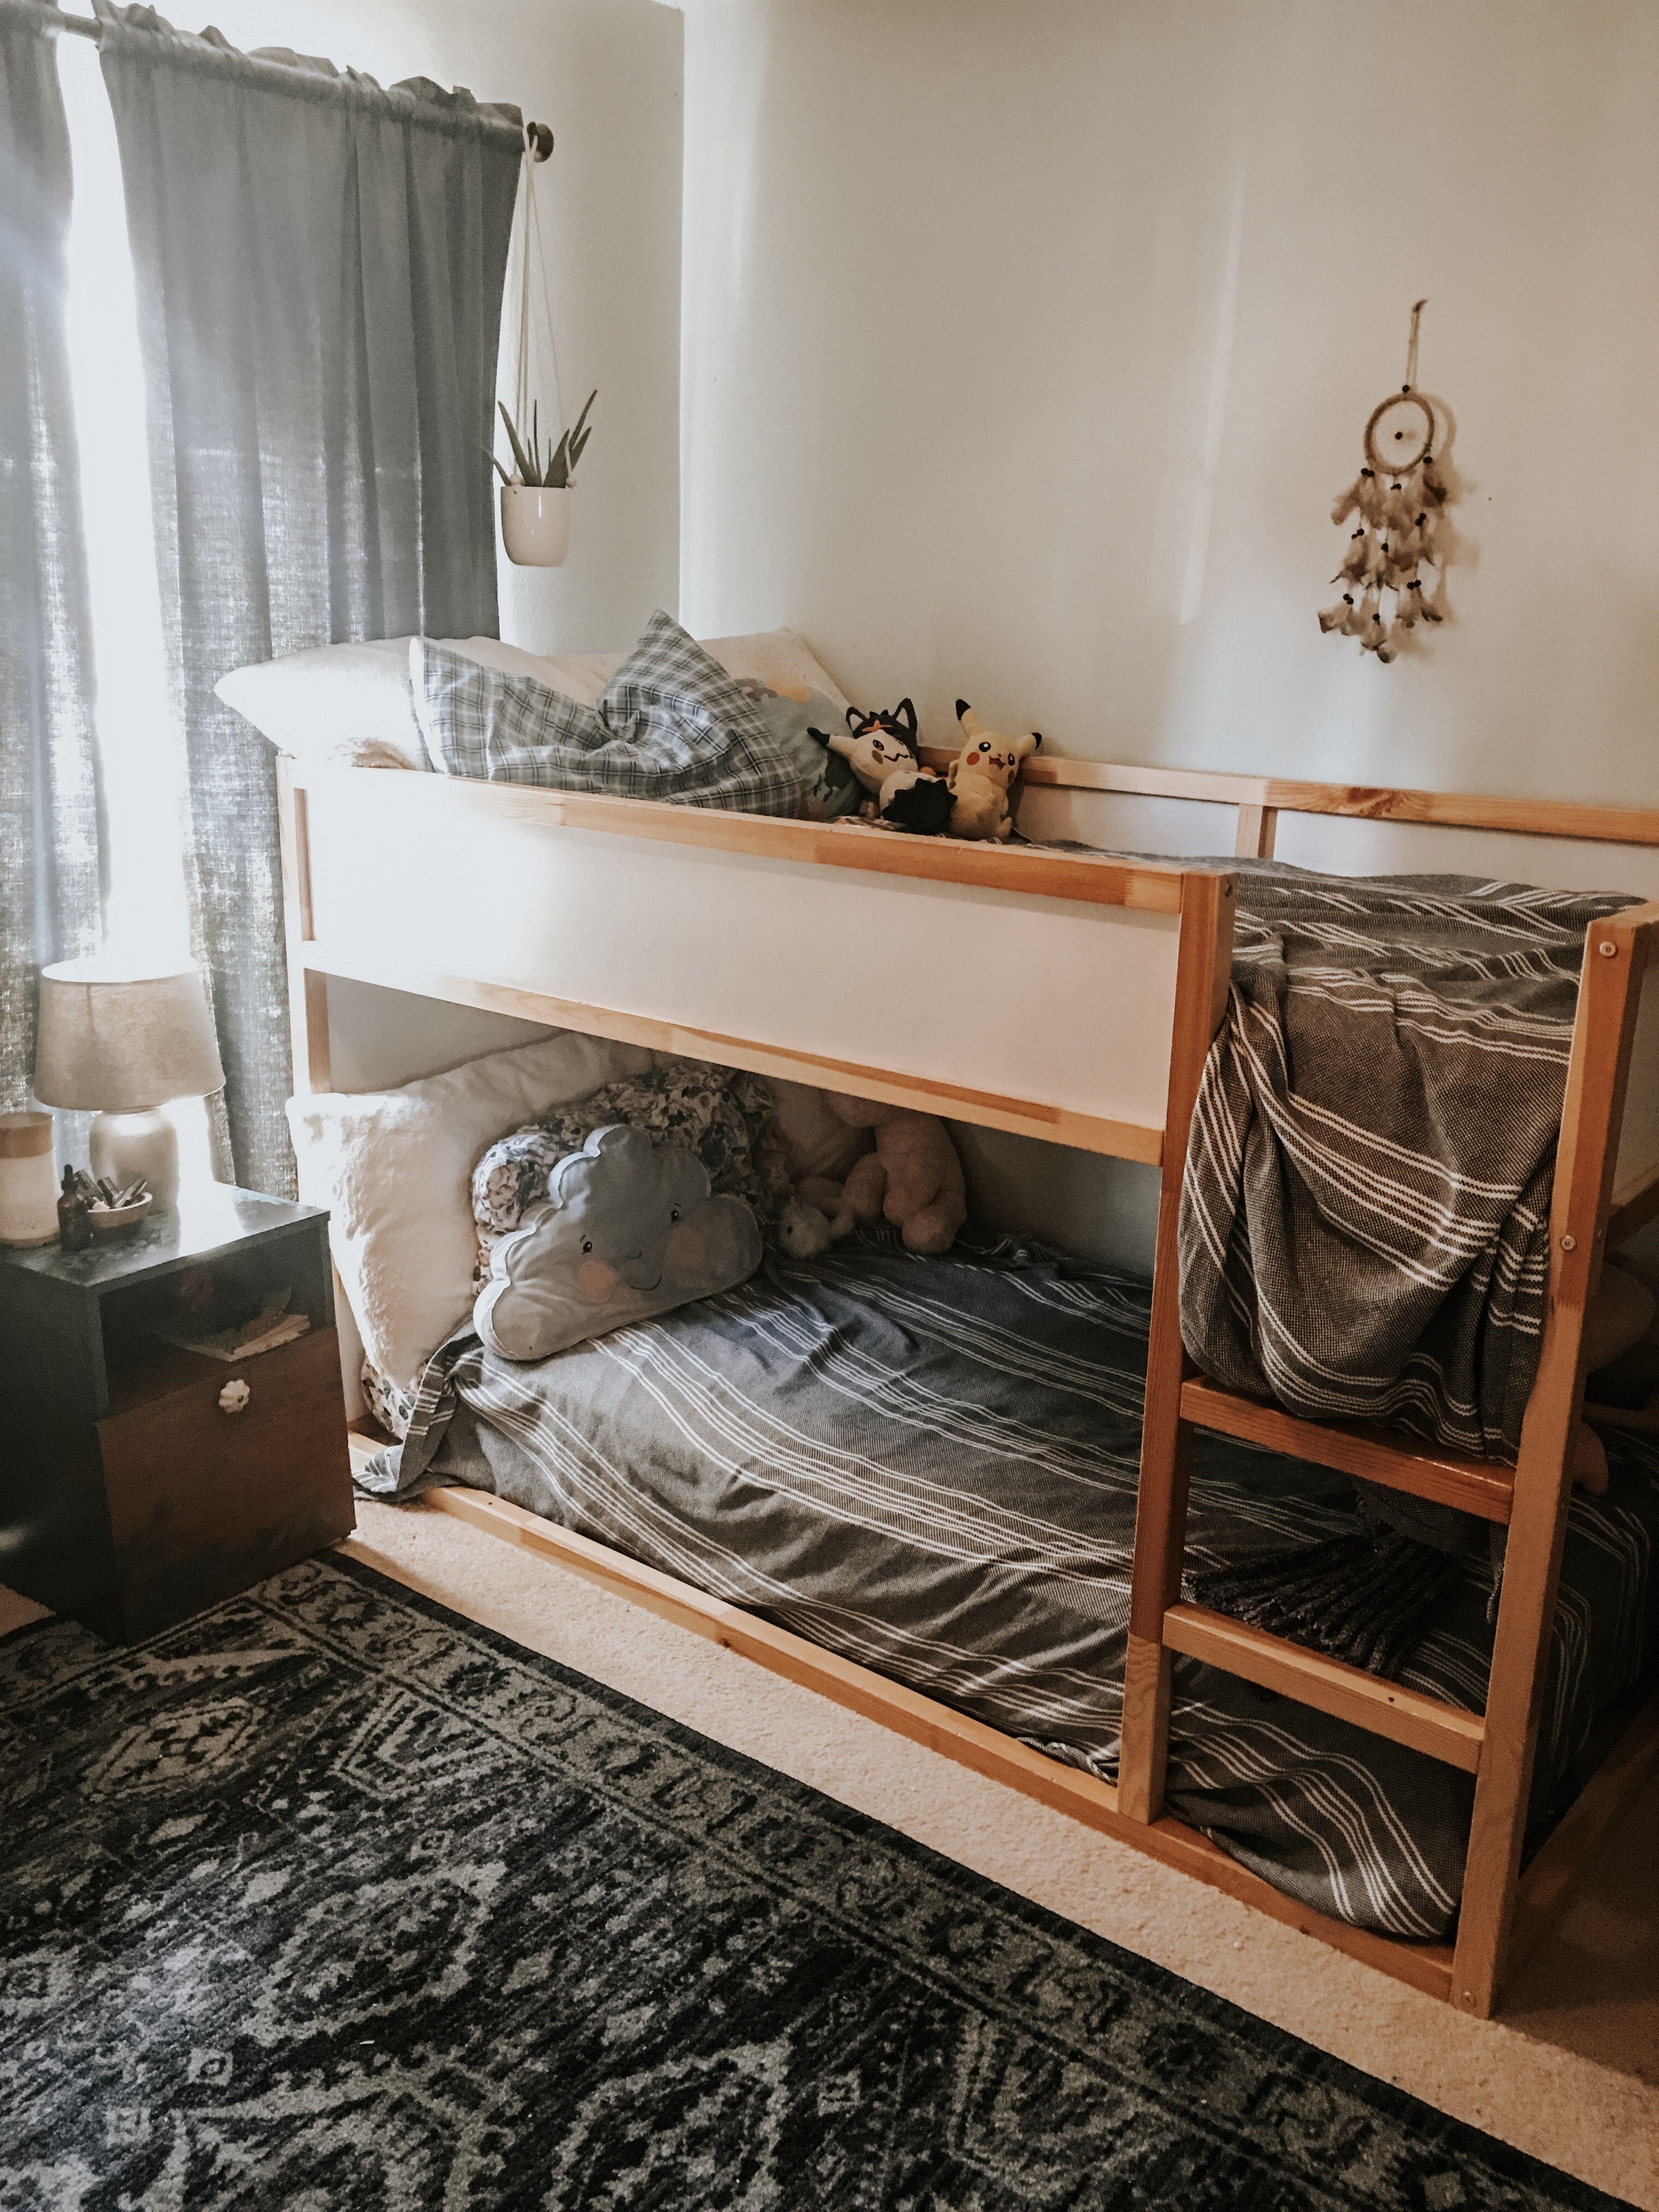 Tavolino Per Balcone Ikea kmroselle : ikea bunk bed in shared brother + sister bedroom